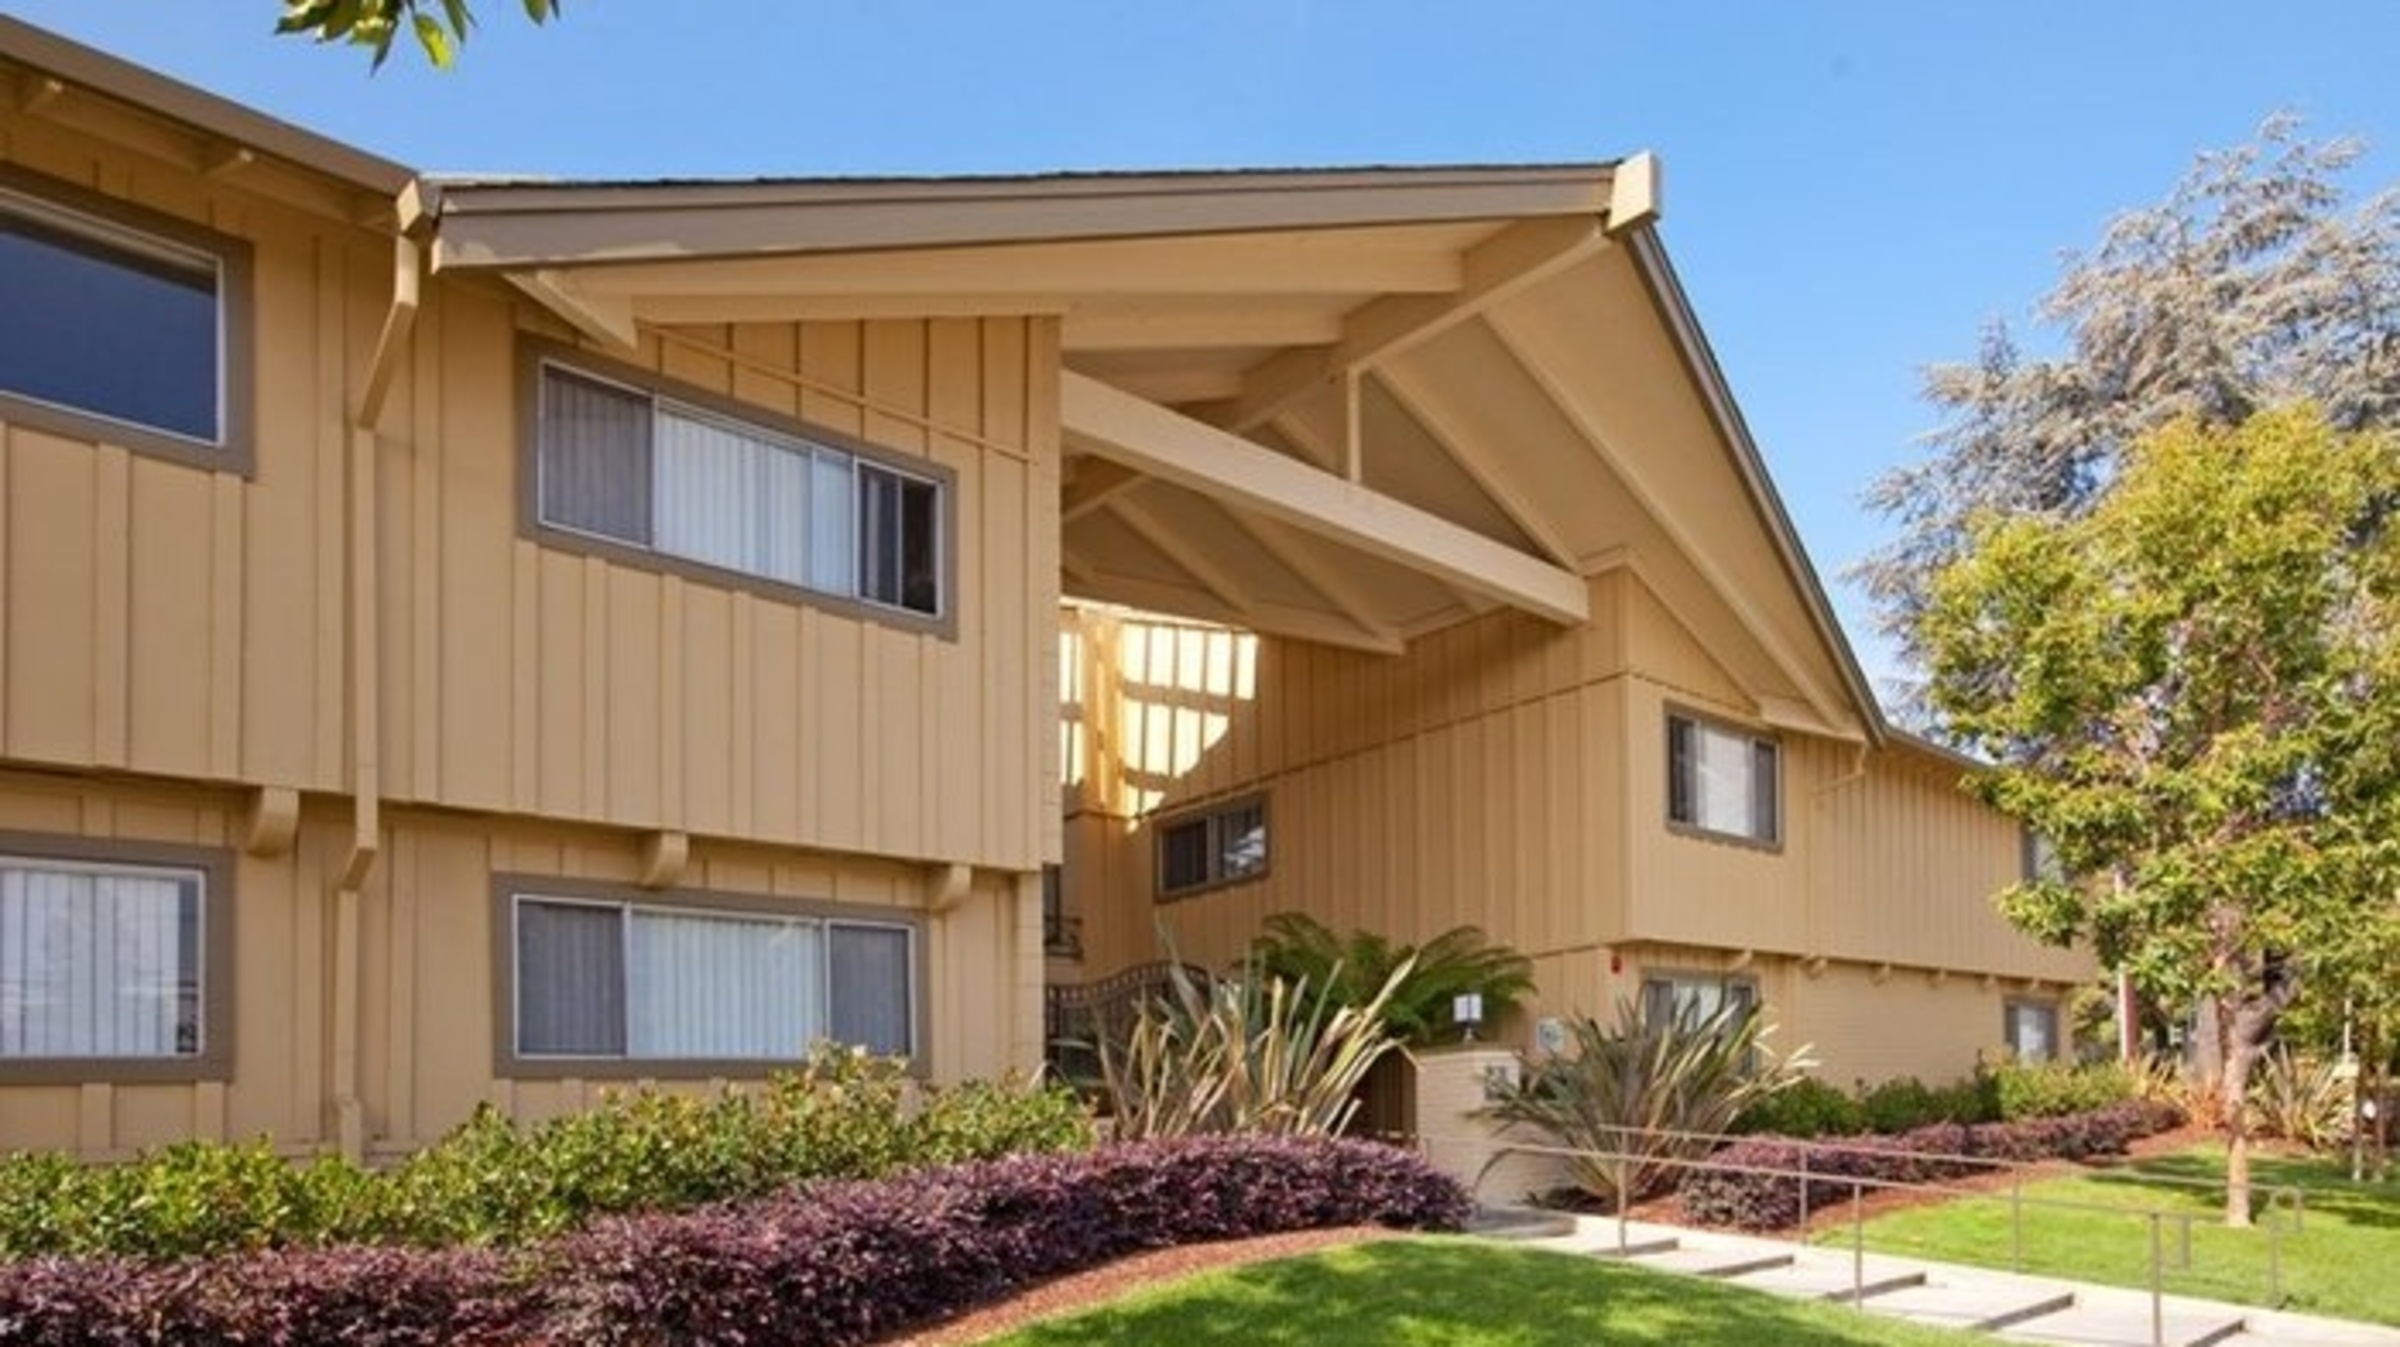 Lyon Maplewood Apartments